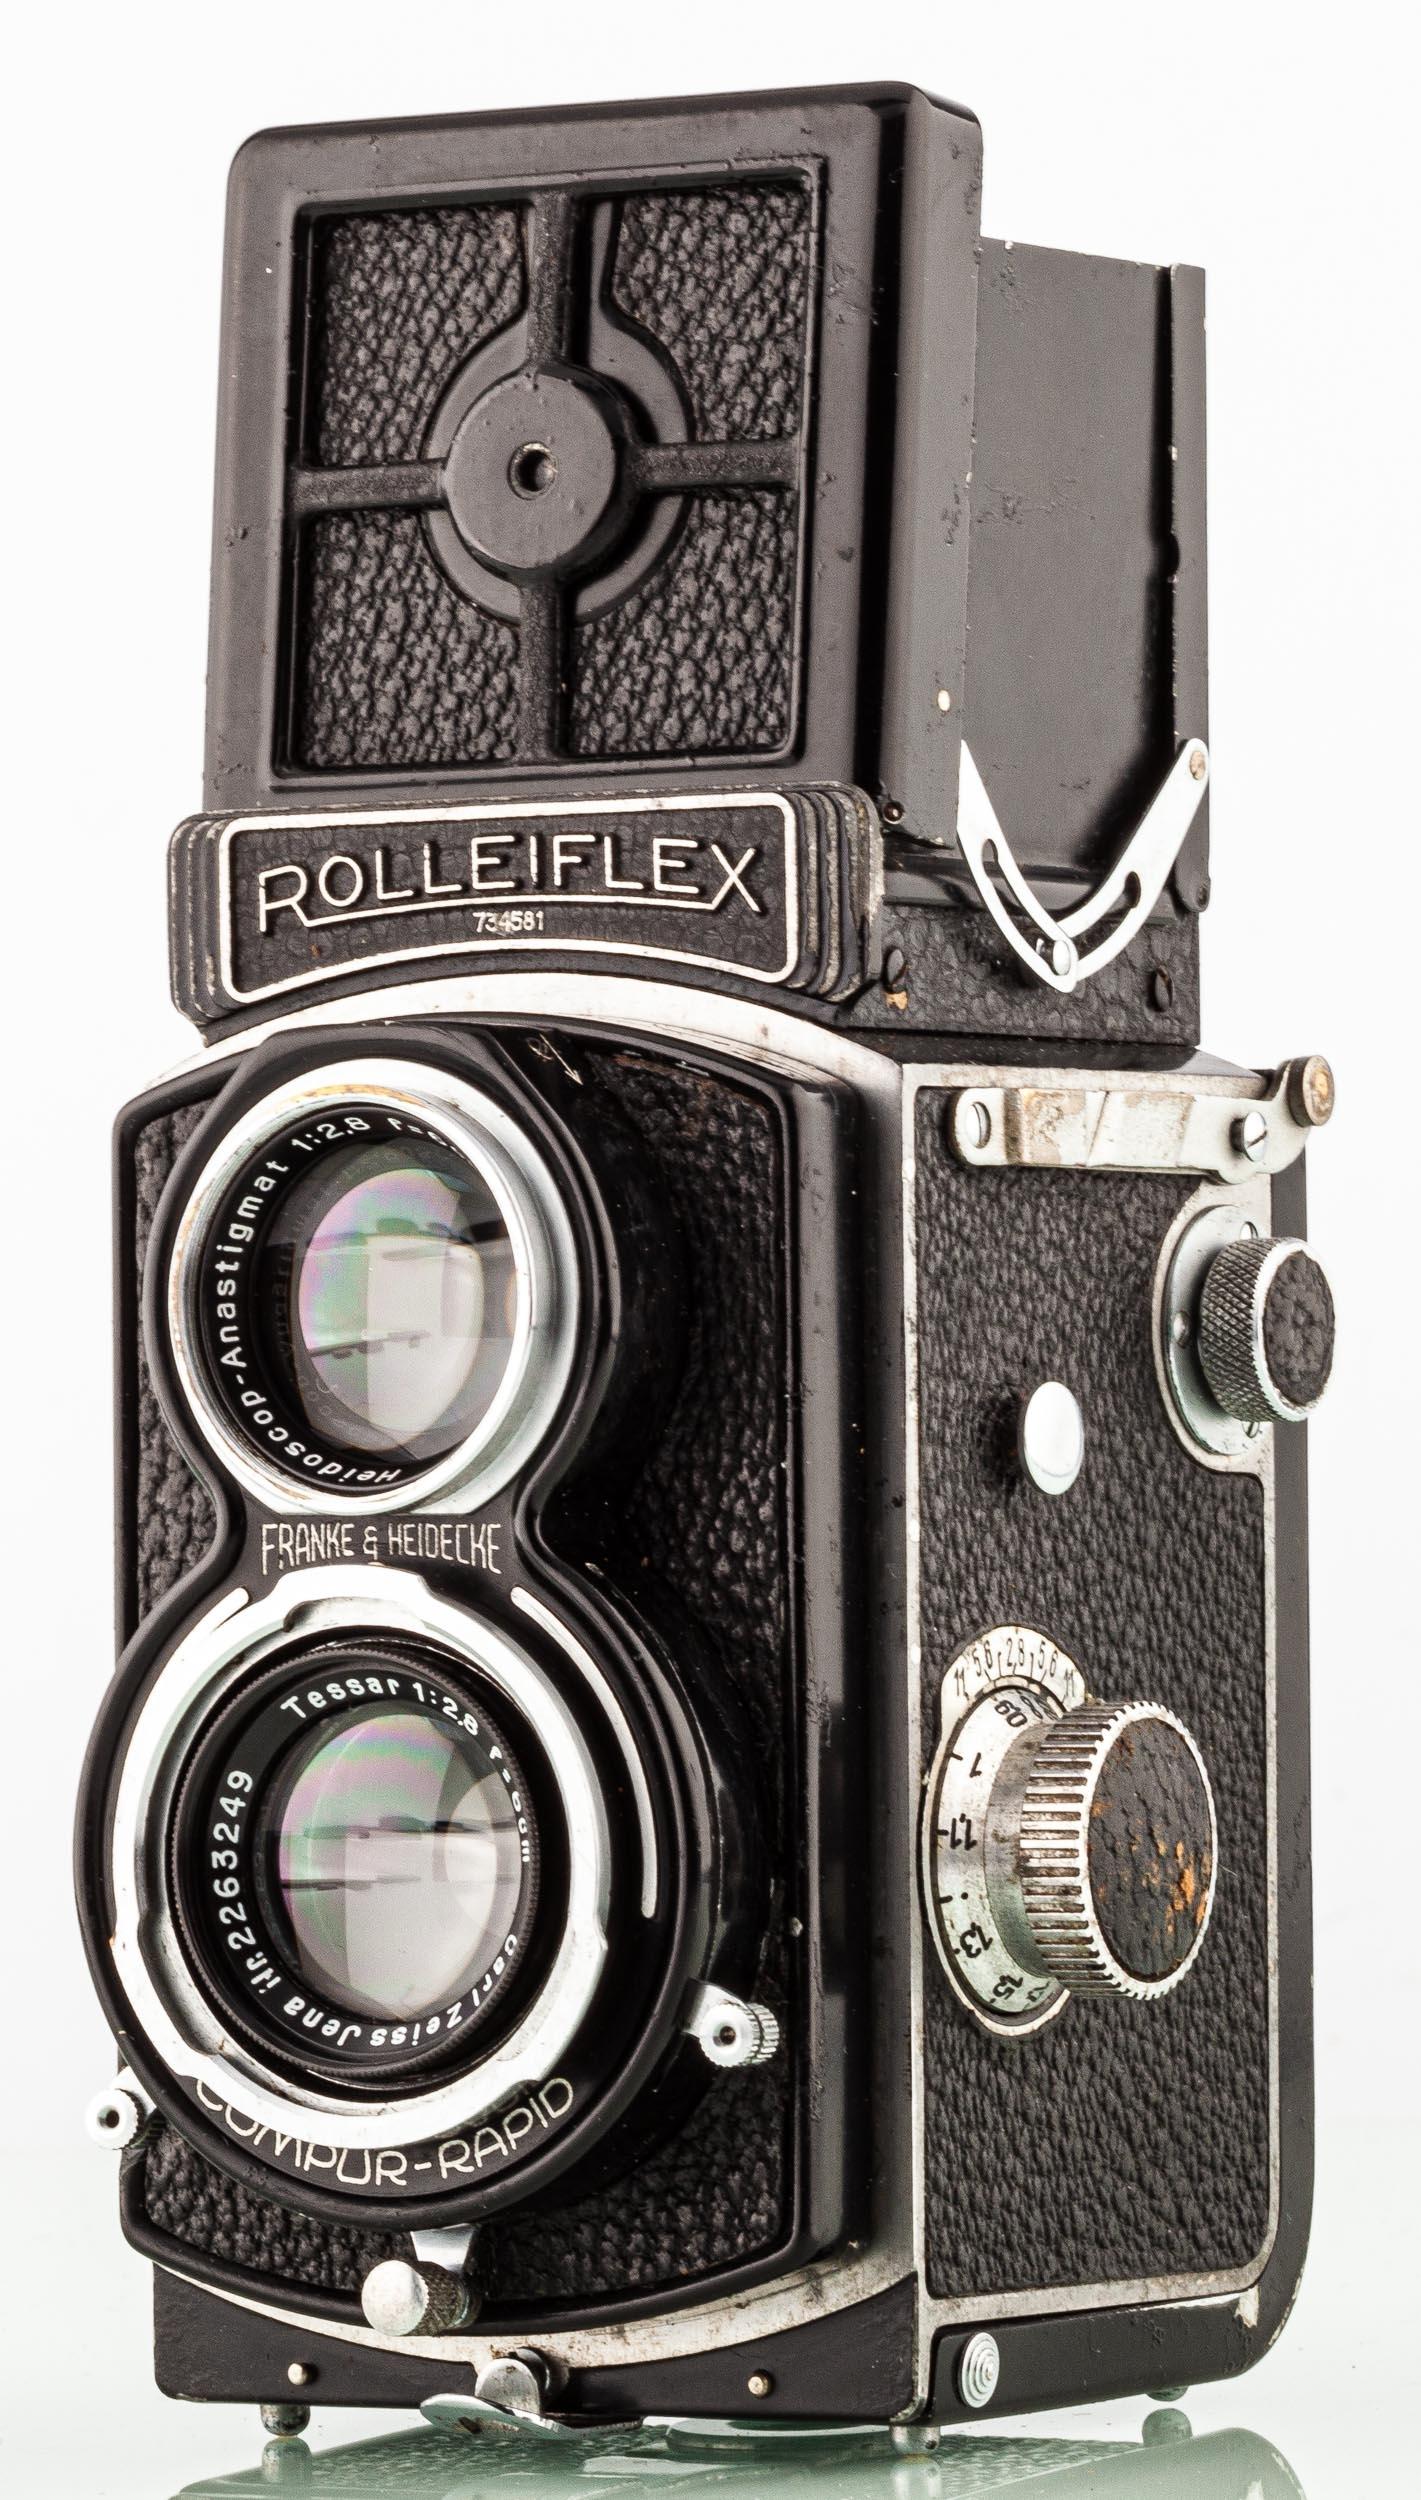 Rolleiflex 4x4 Baby